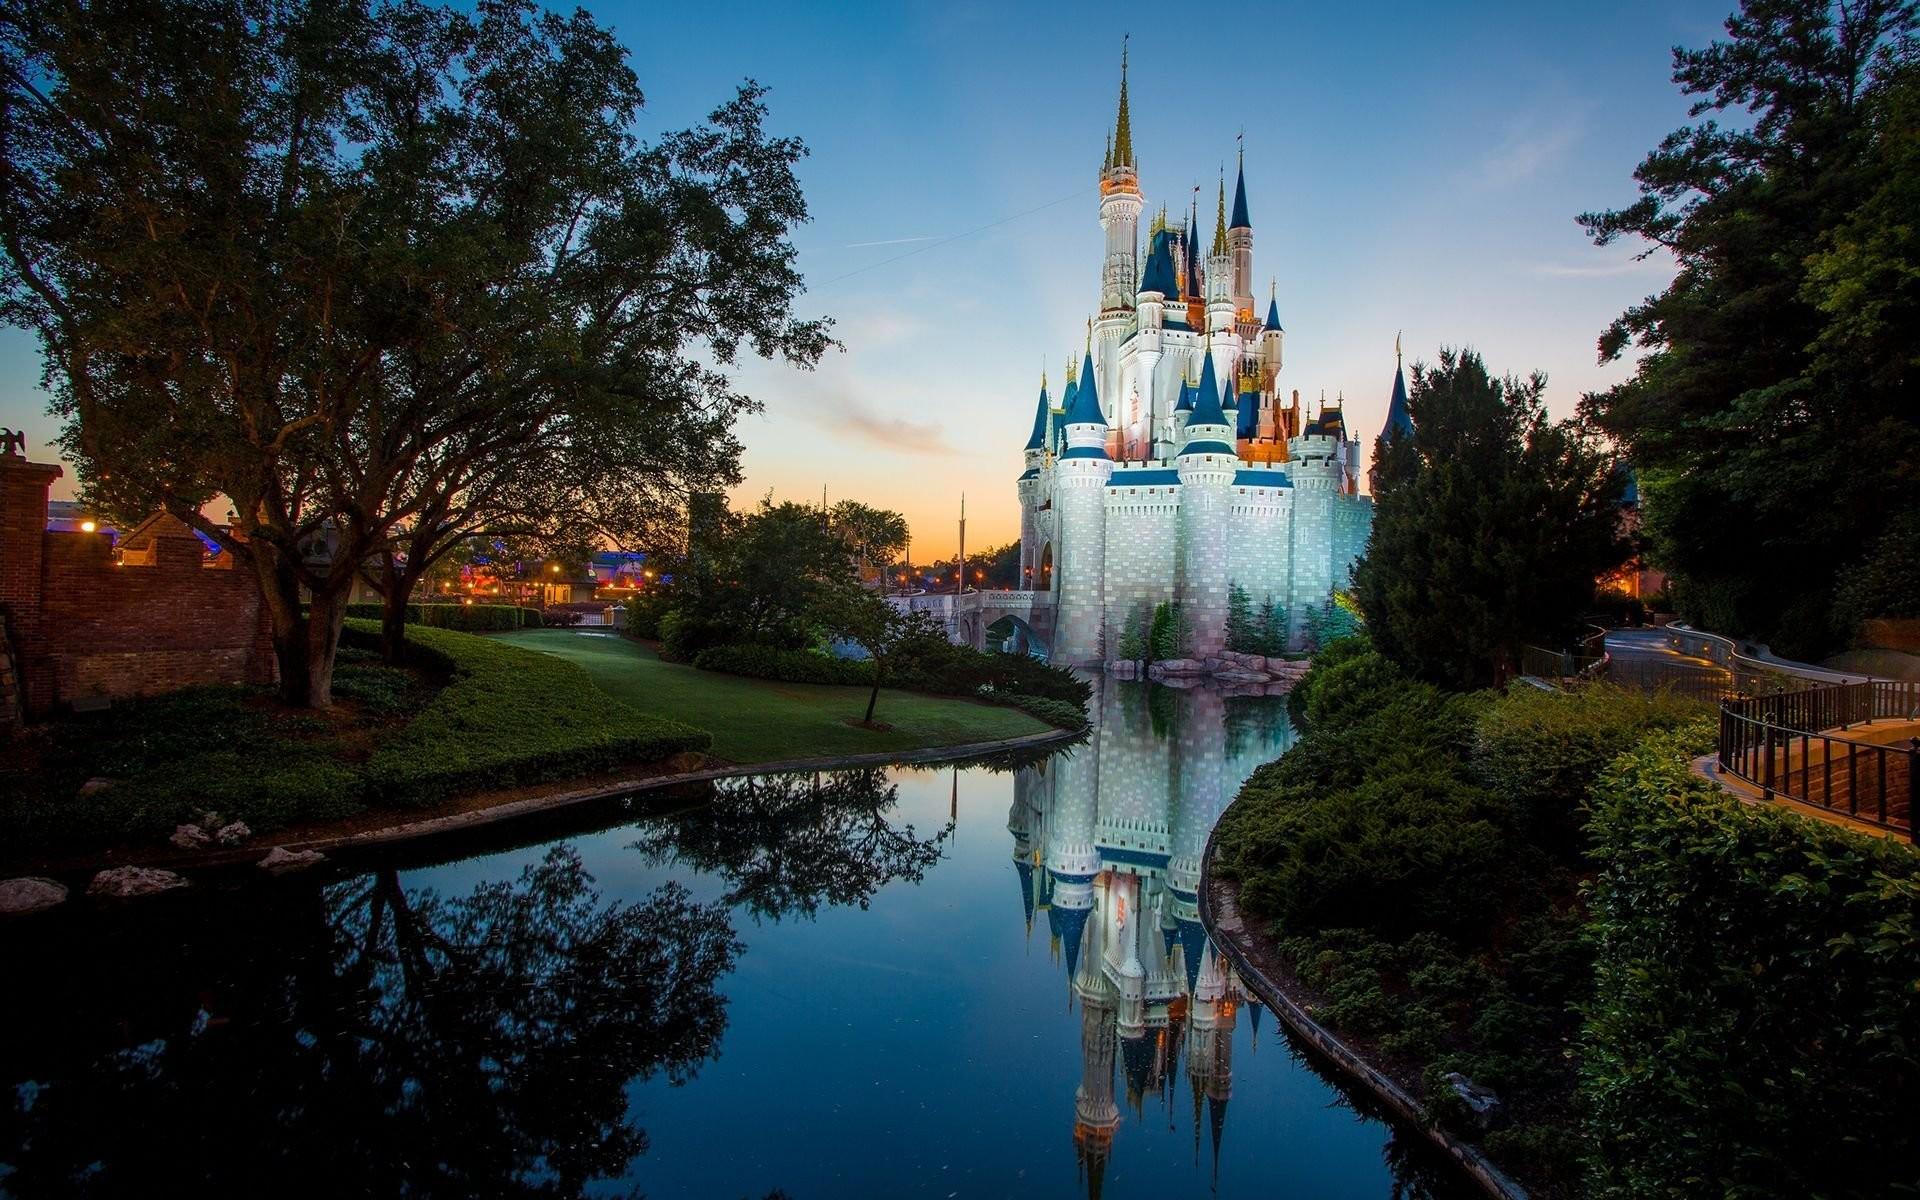 Disney Desktop Wallpaper Hd: Disney World Wallpapers (56+ Images